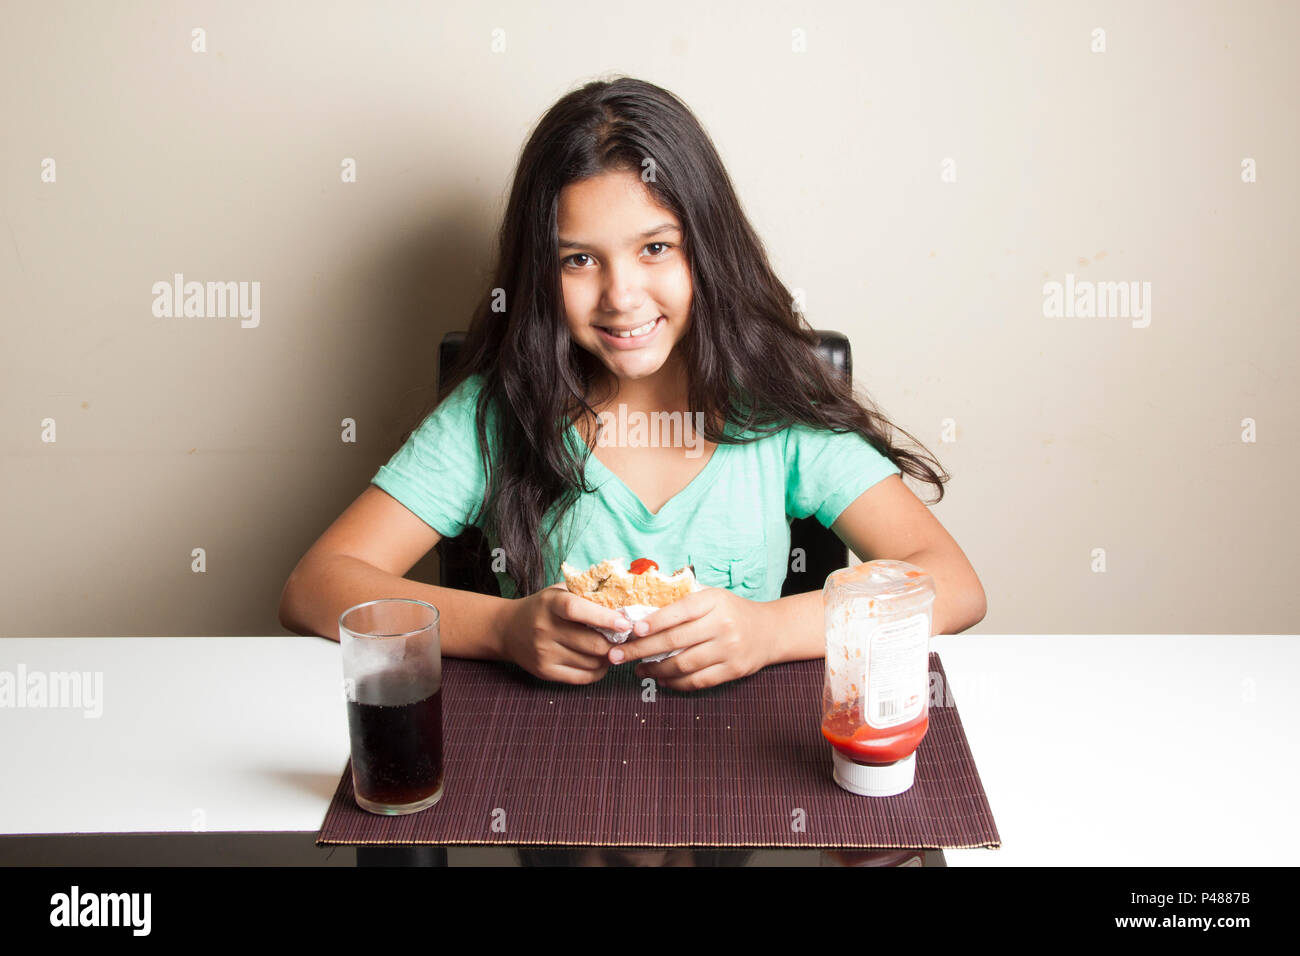 Adolescente comendo hamburguer. São Paulo/SP, Brasil. 030/03/2015. Foto: Irene Araujo / Fotoarena. Imagen De Stock